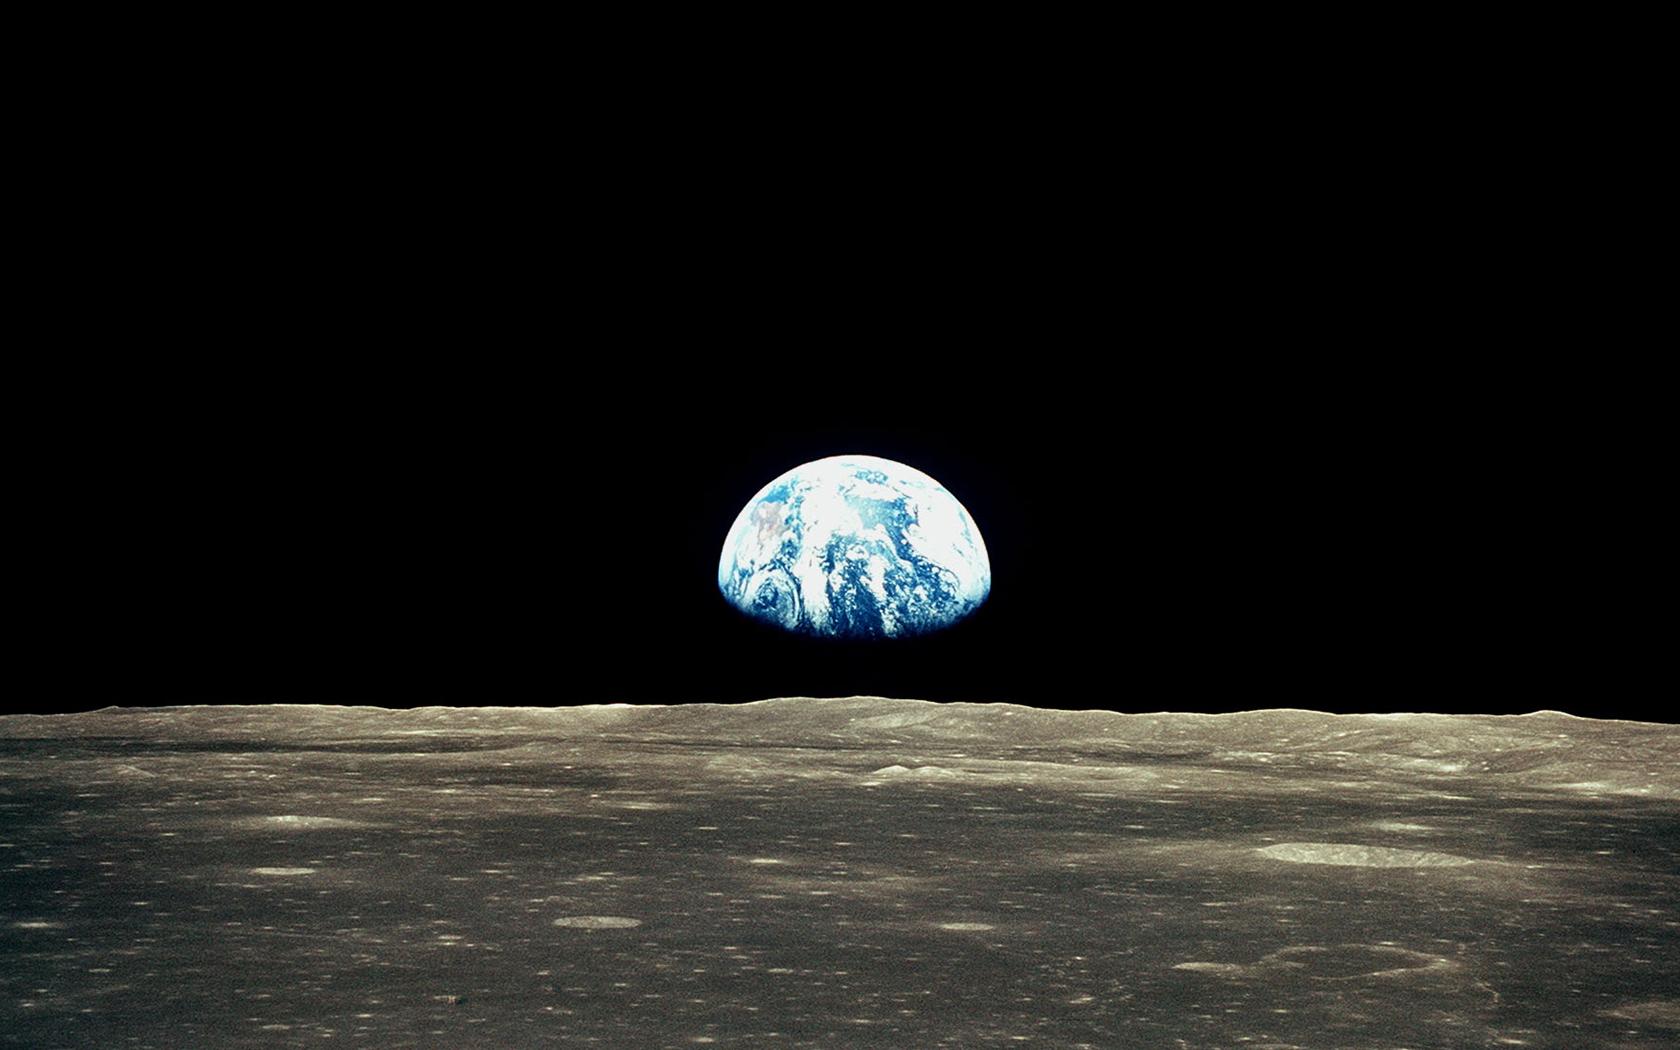 Earthrise from moon wallpaper wallpapersafari - Space moon wallpaper ...